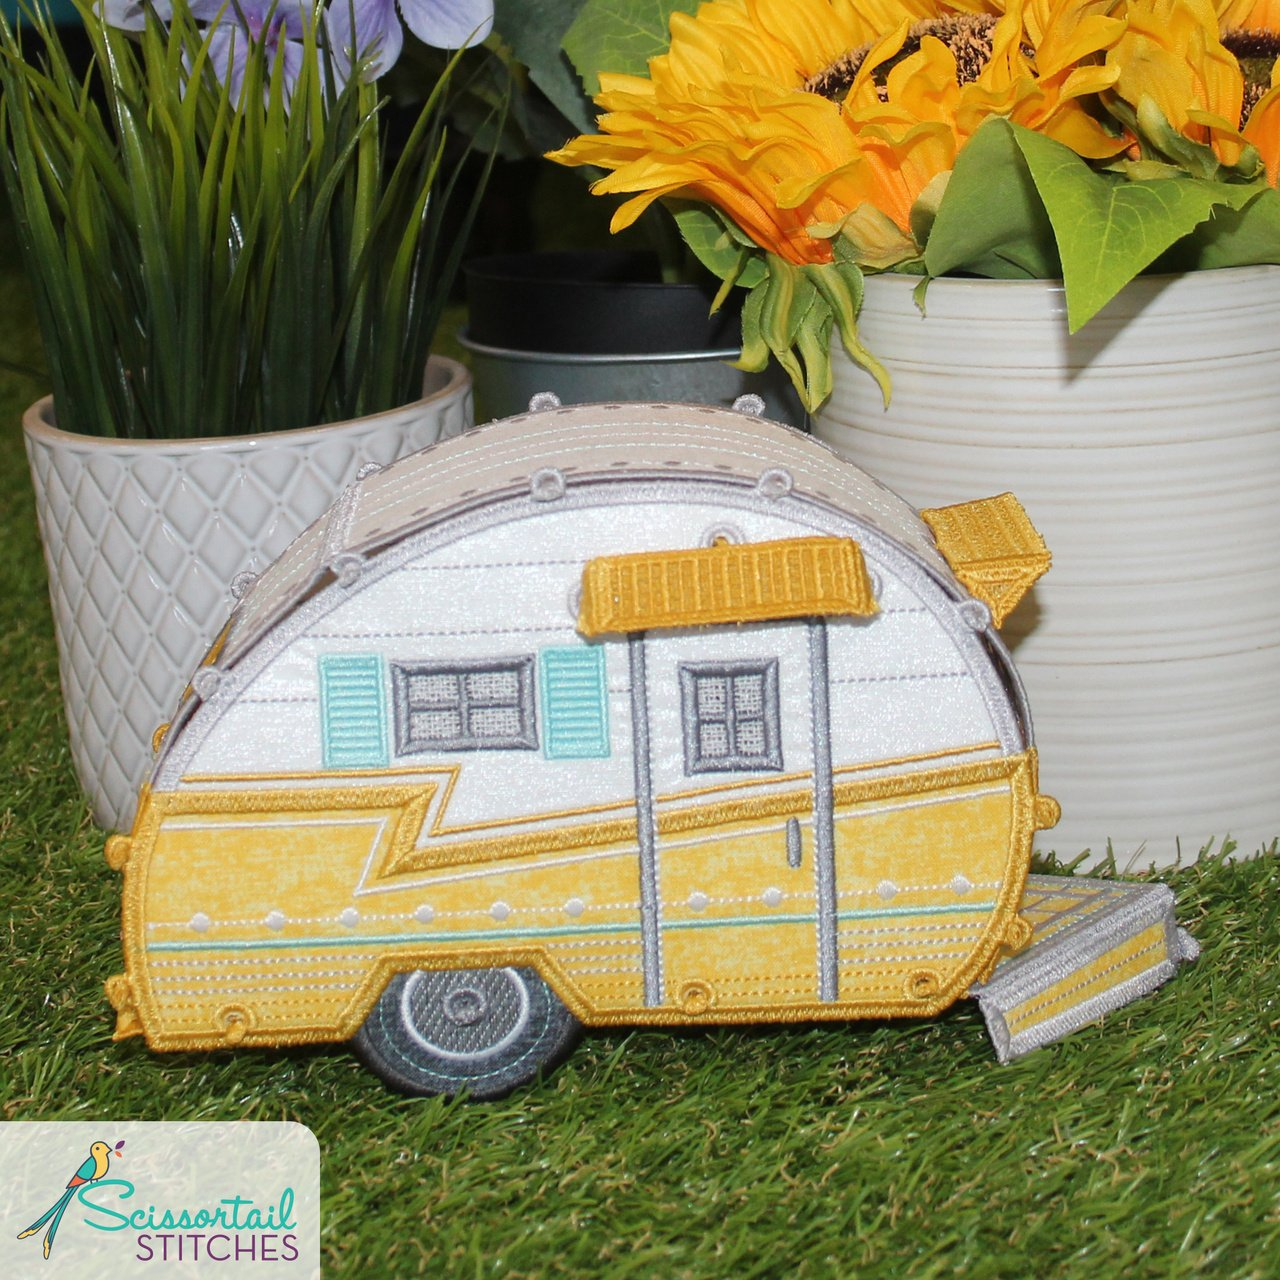 Scissortail Stitches Freestanding Happy Campers